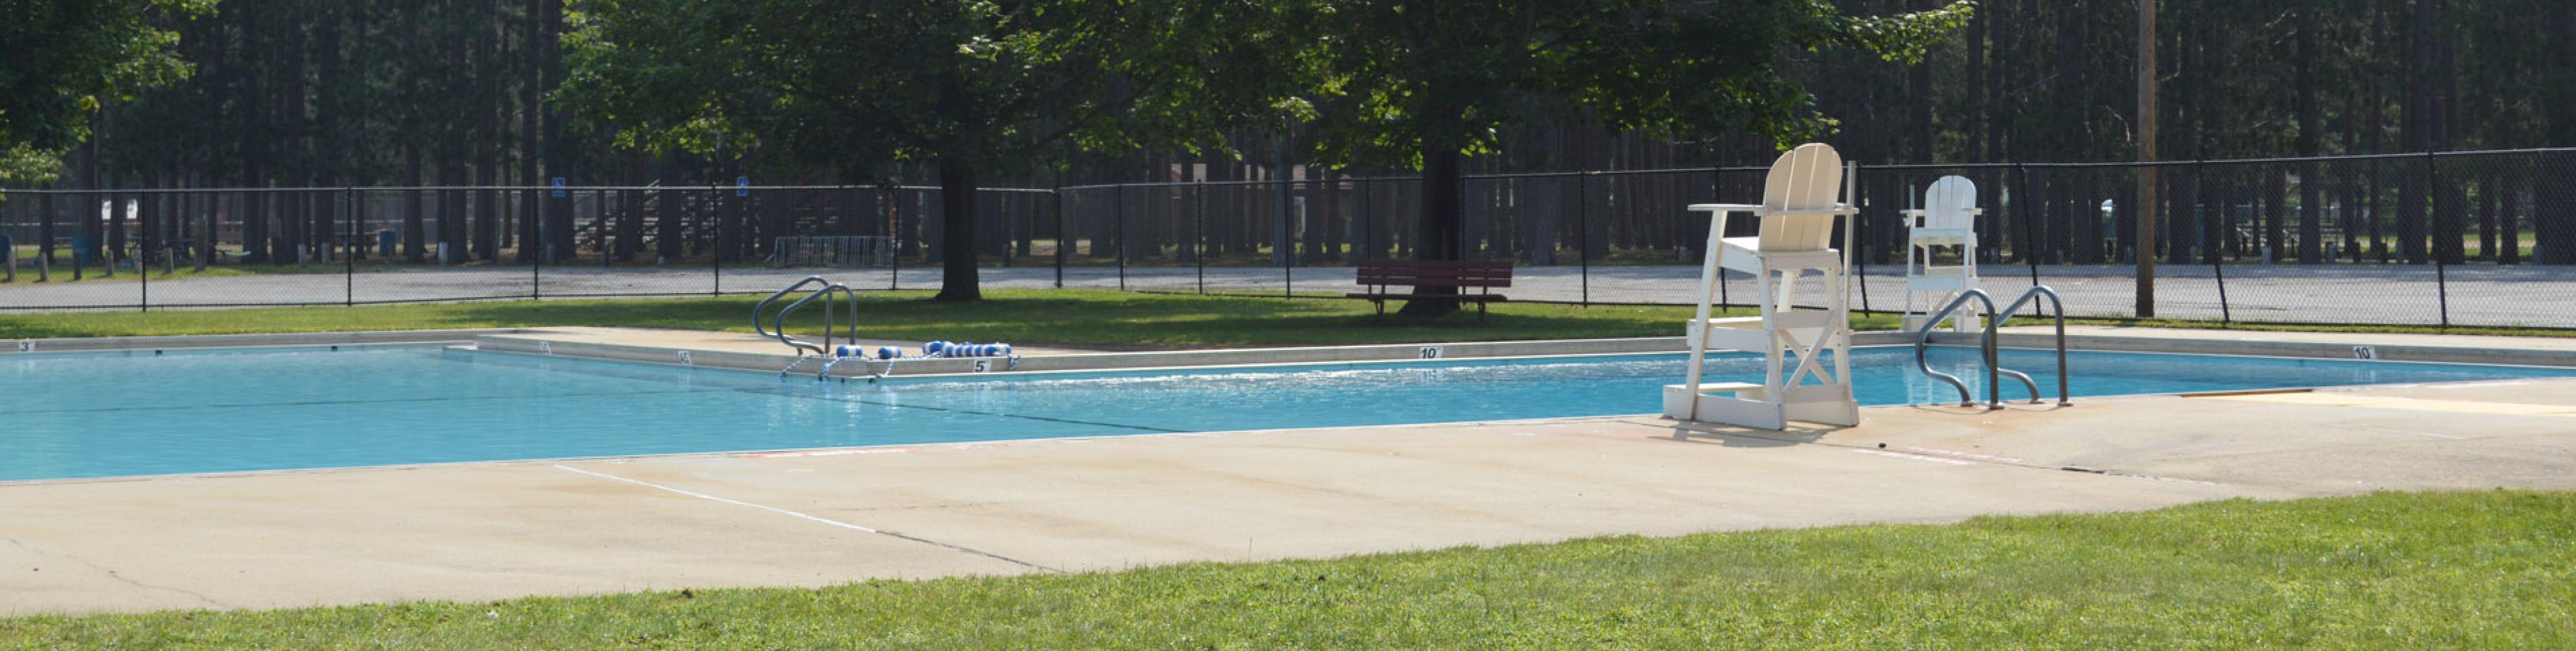 Swimming Pools City Of Keene